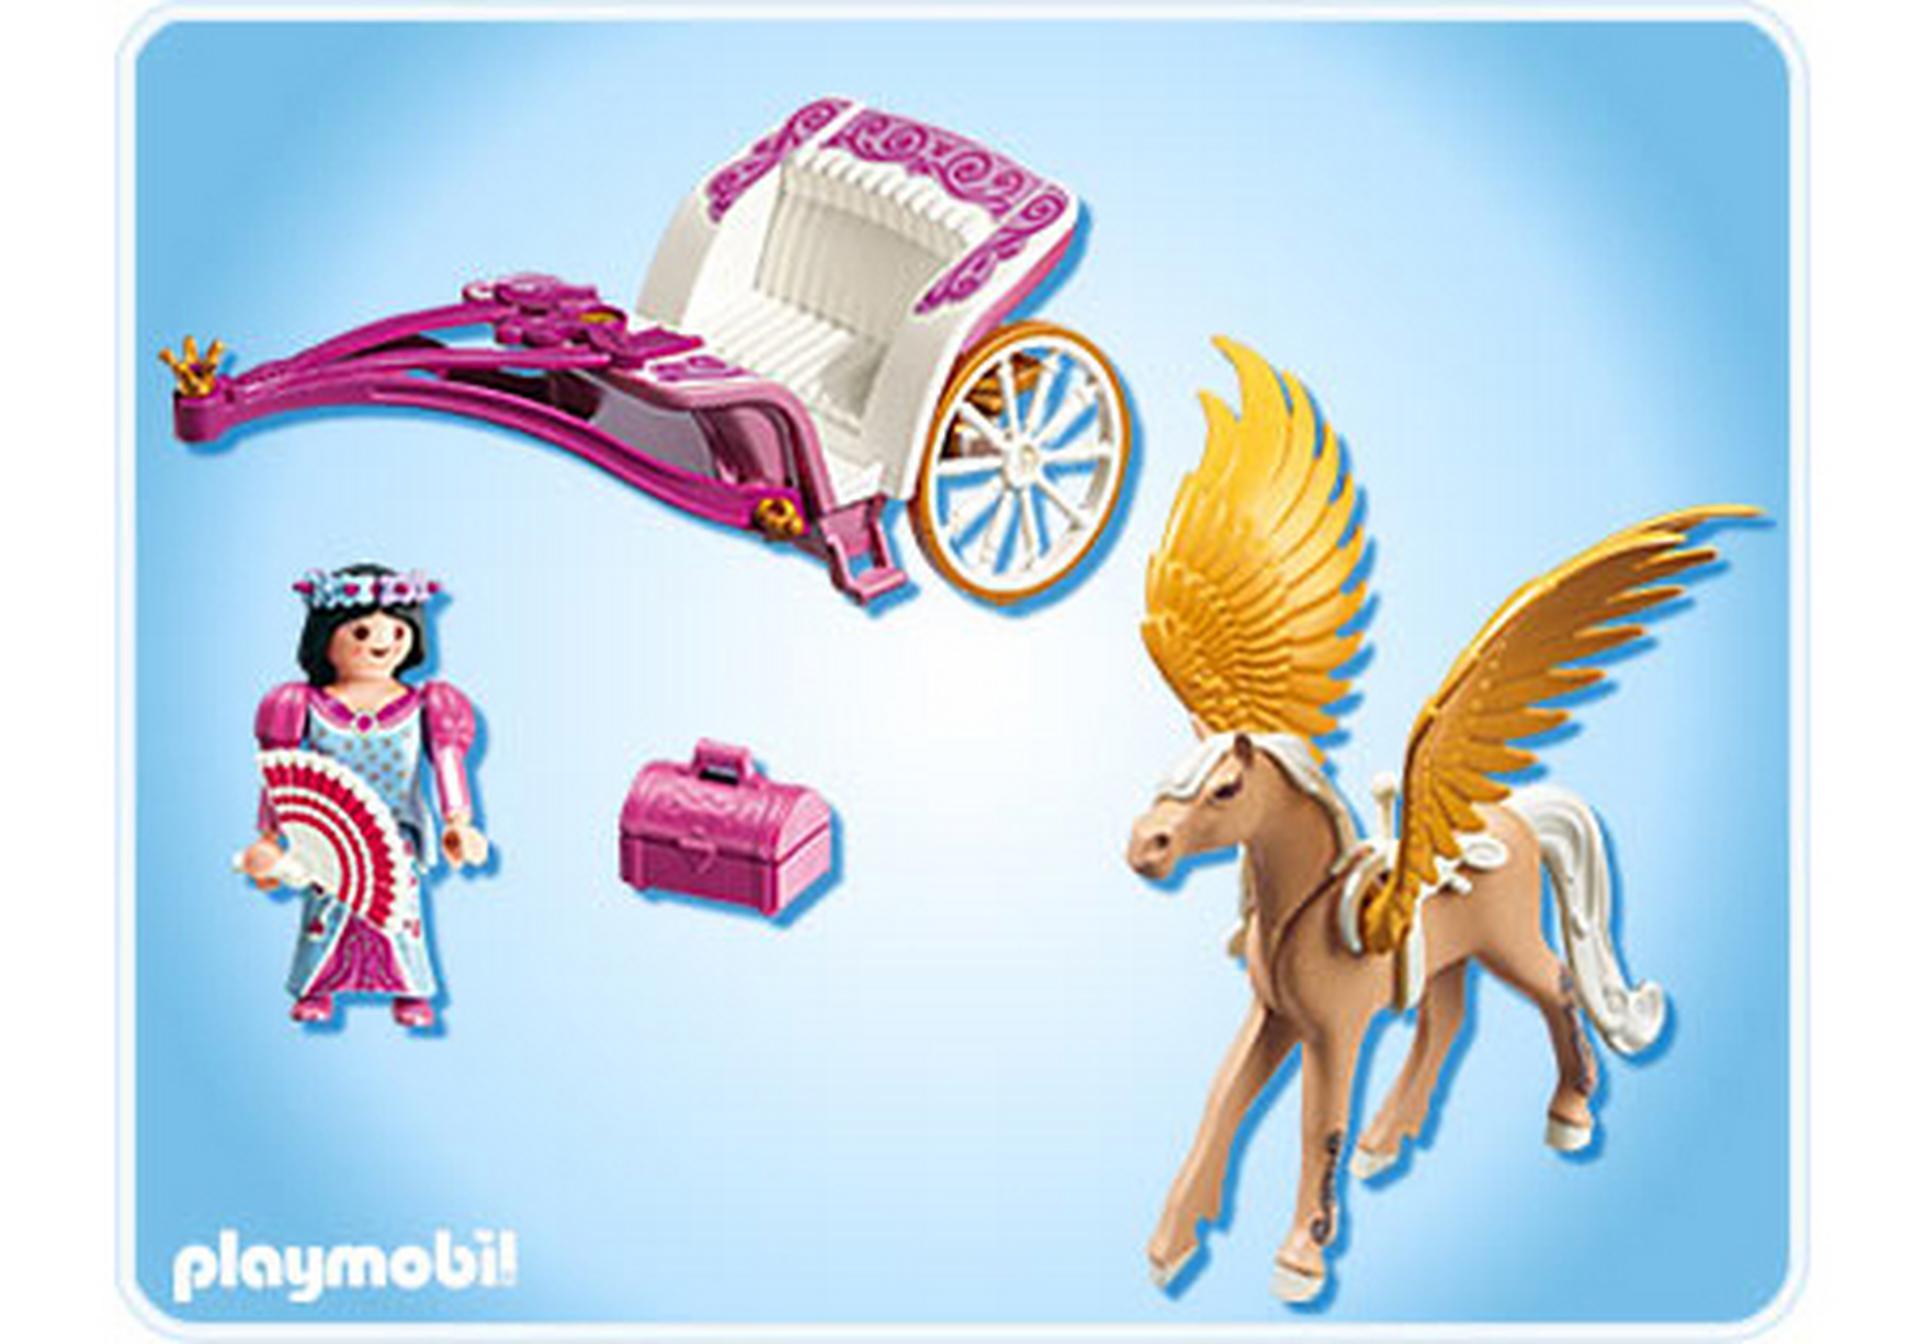 Pegasus kutsche 5143 a playmobil deutschland - Playmobil kutsche ...